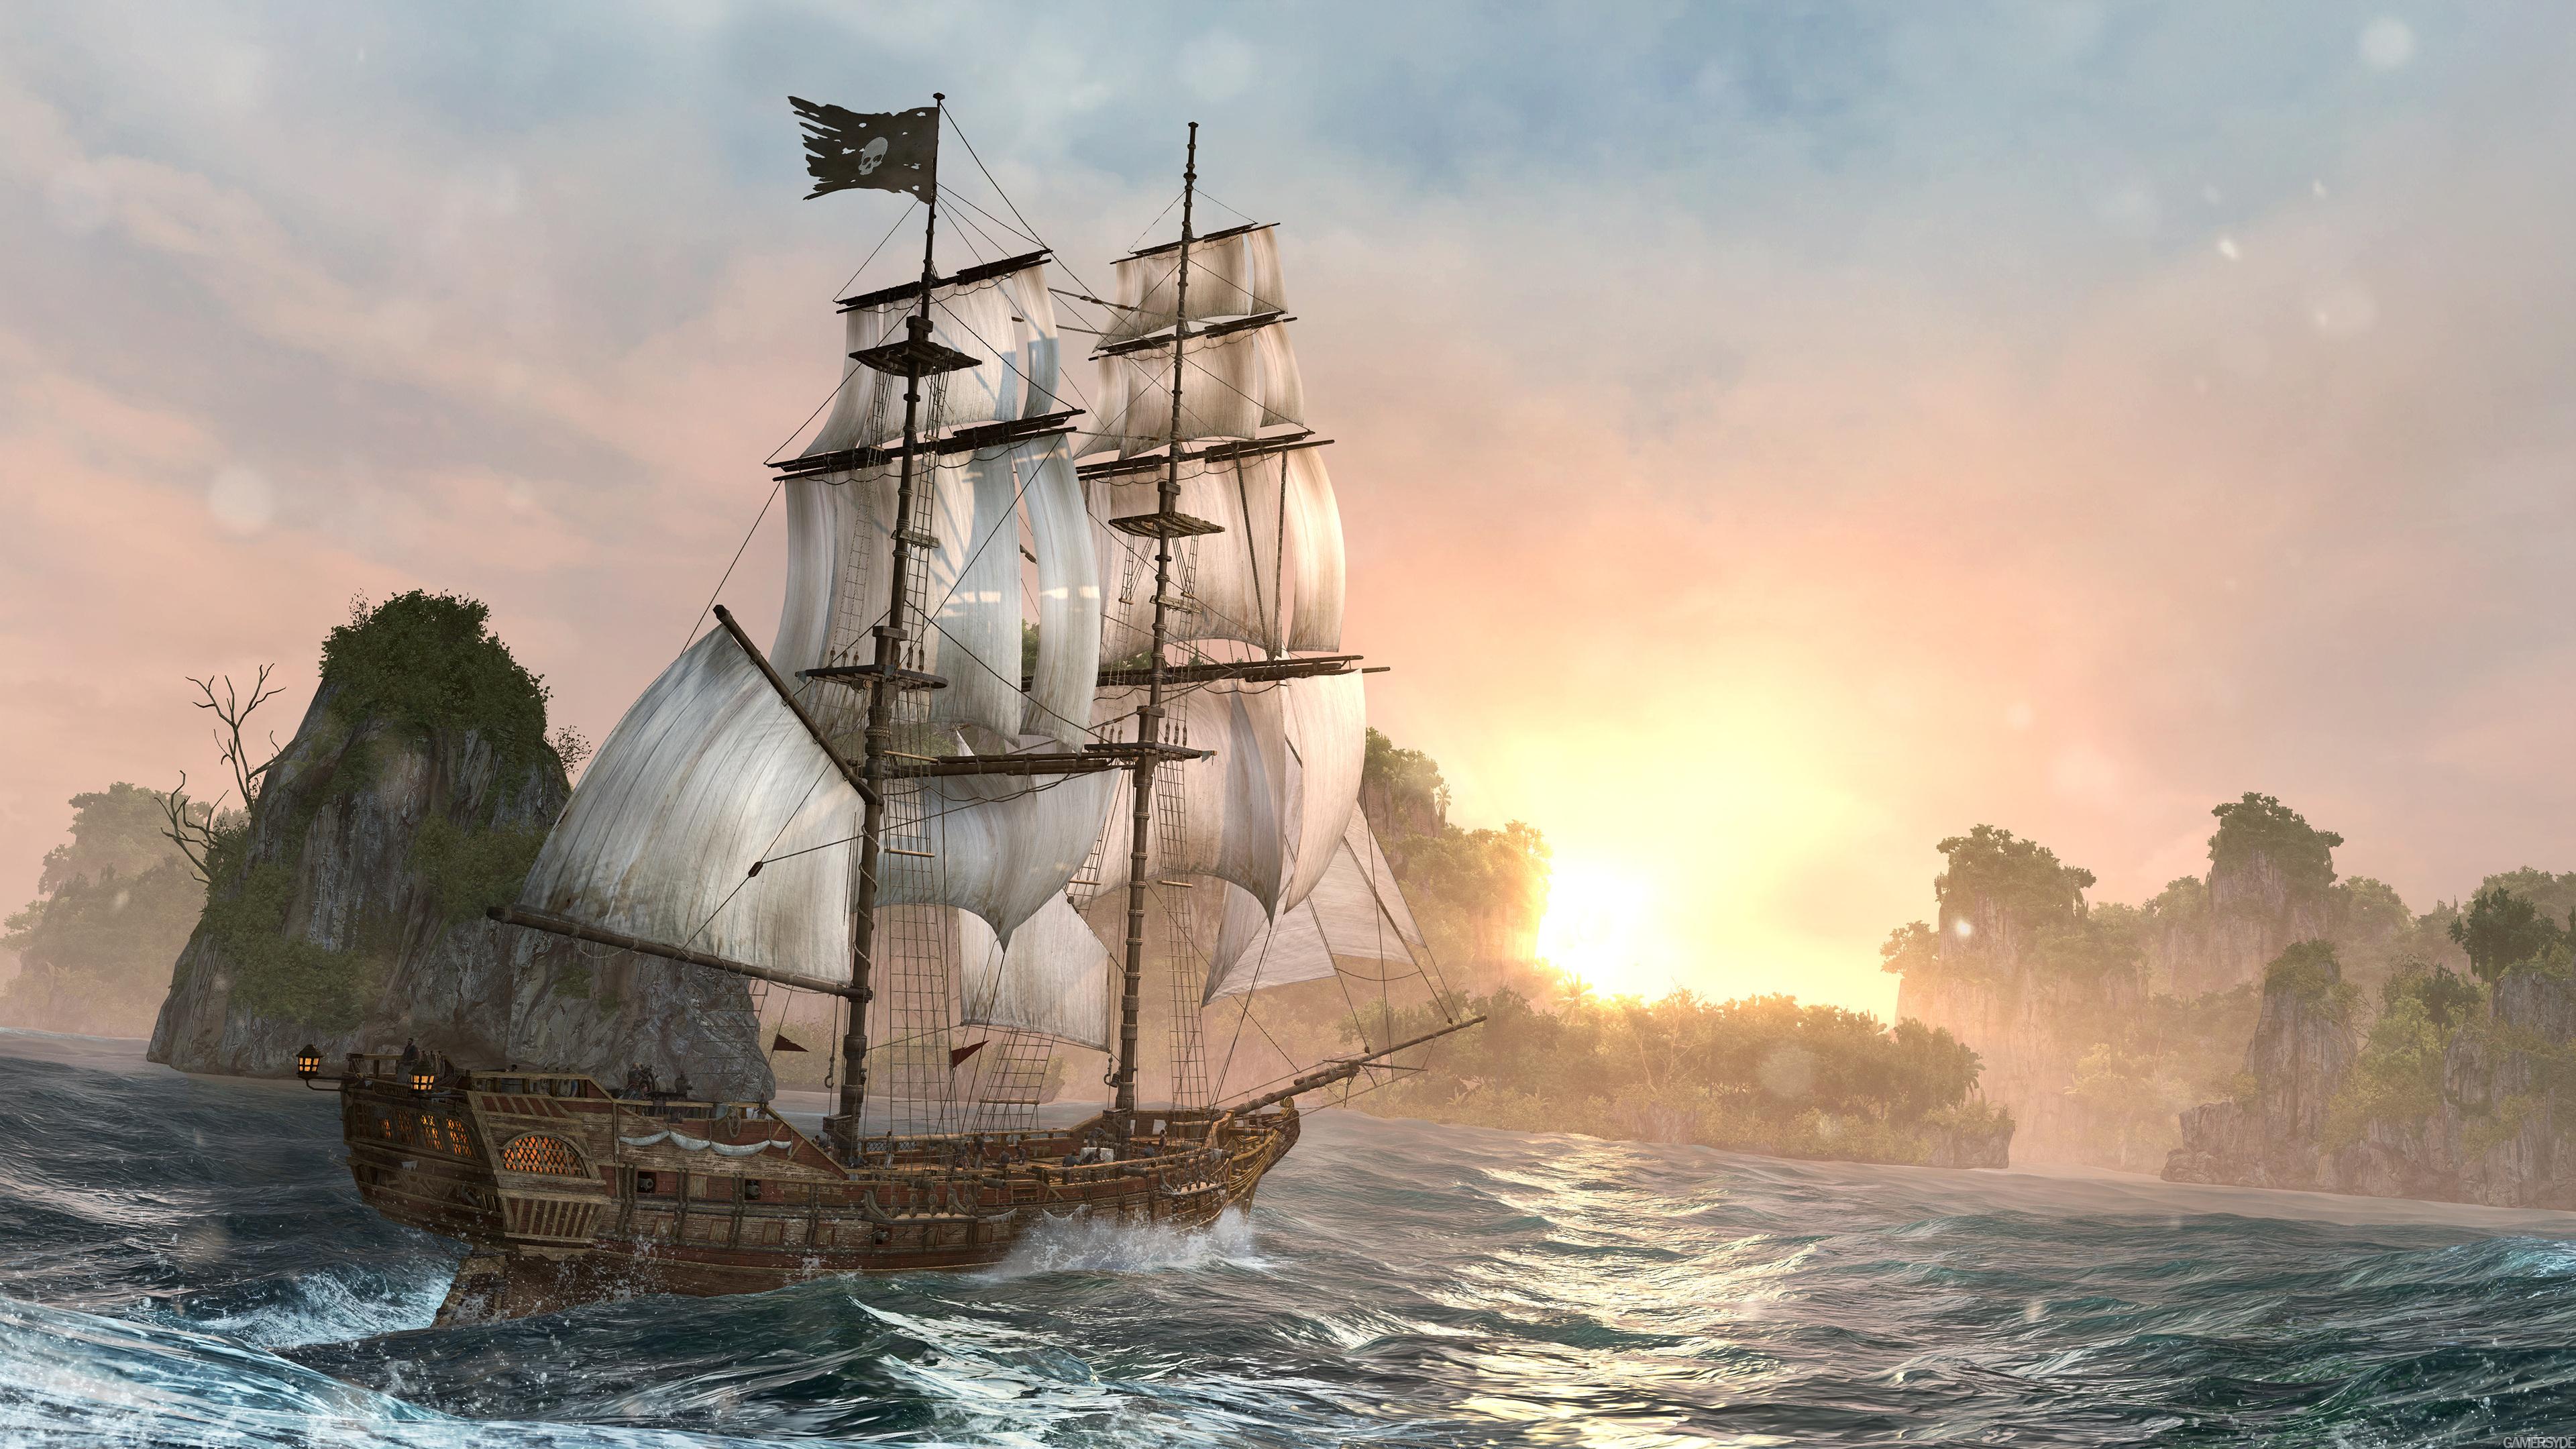 Hd Wallpaper Assassins Creed Black Flag 4k 961025 Hd